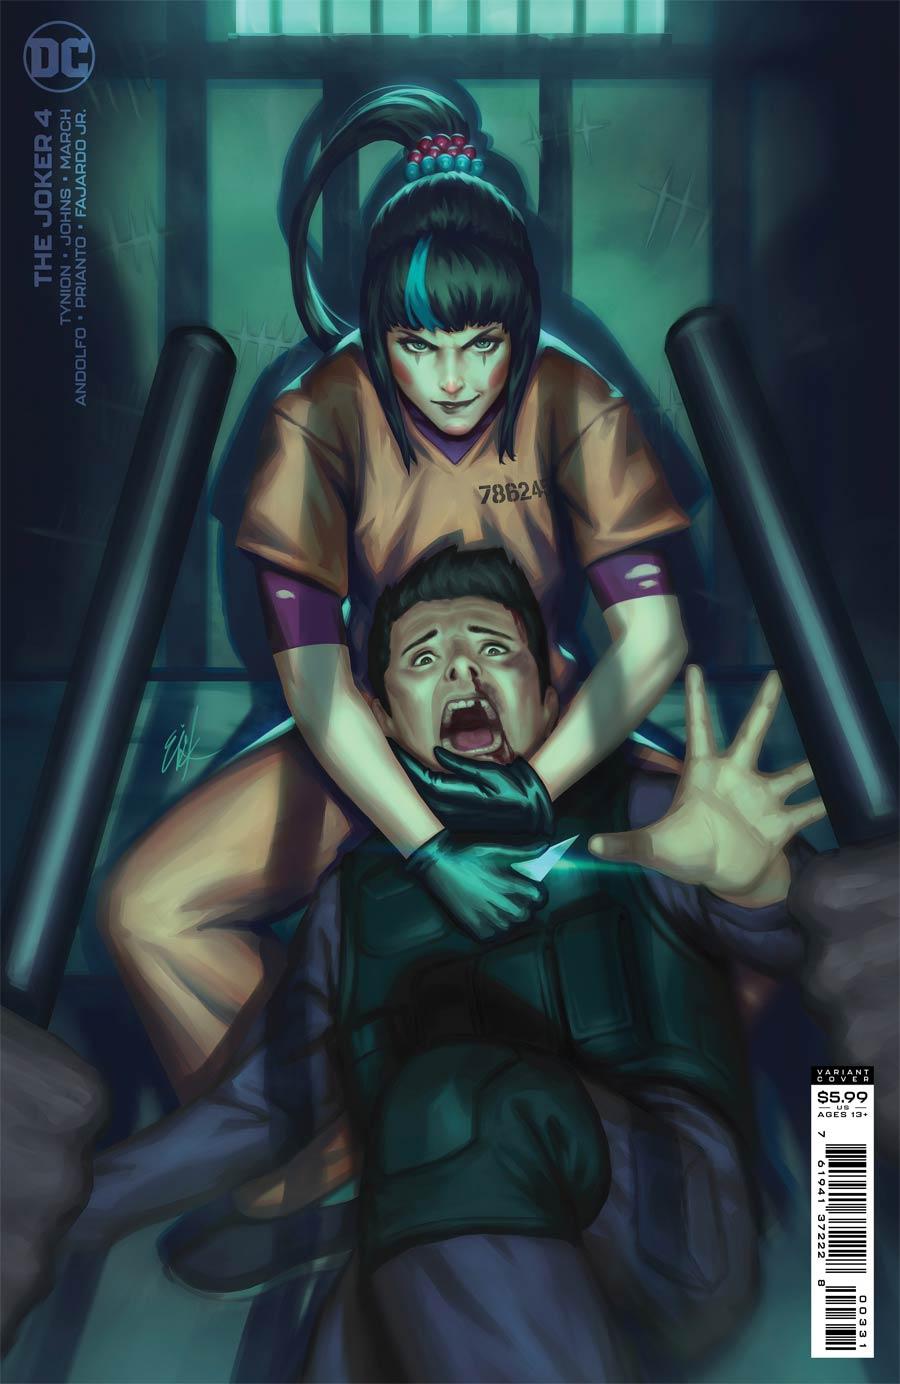 Joker Vol 2 #4 Cover C Variant Ejikure Cover